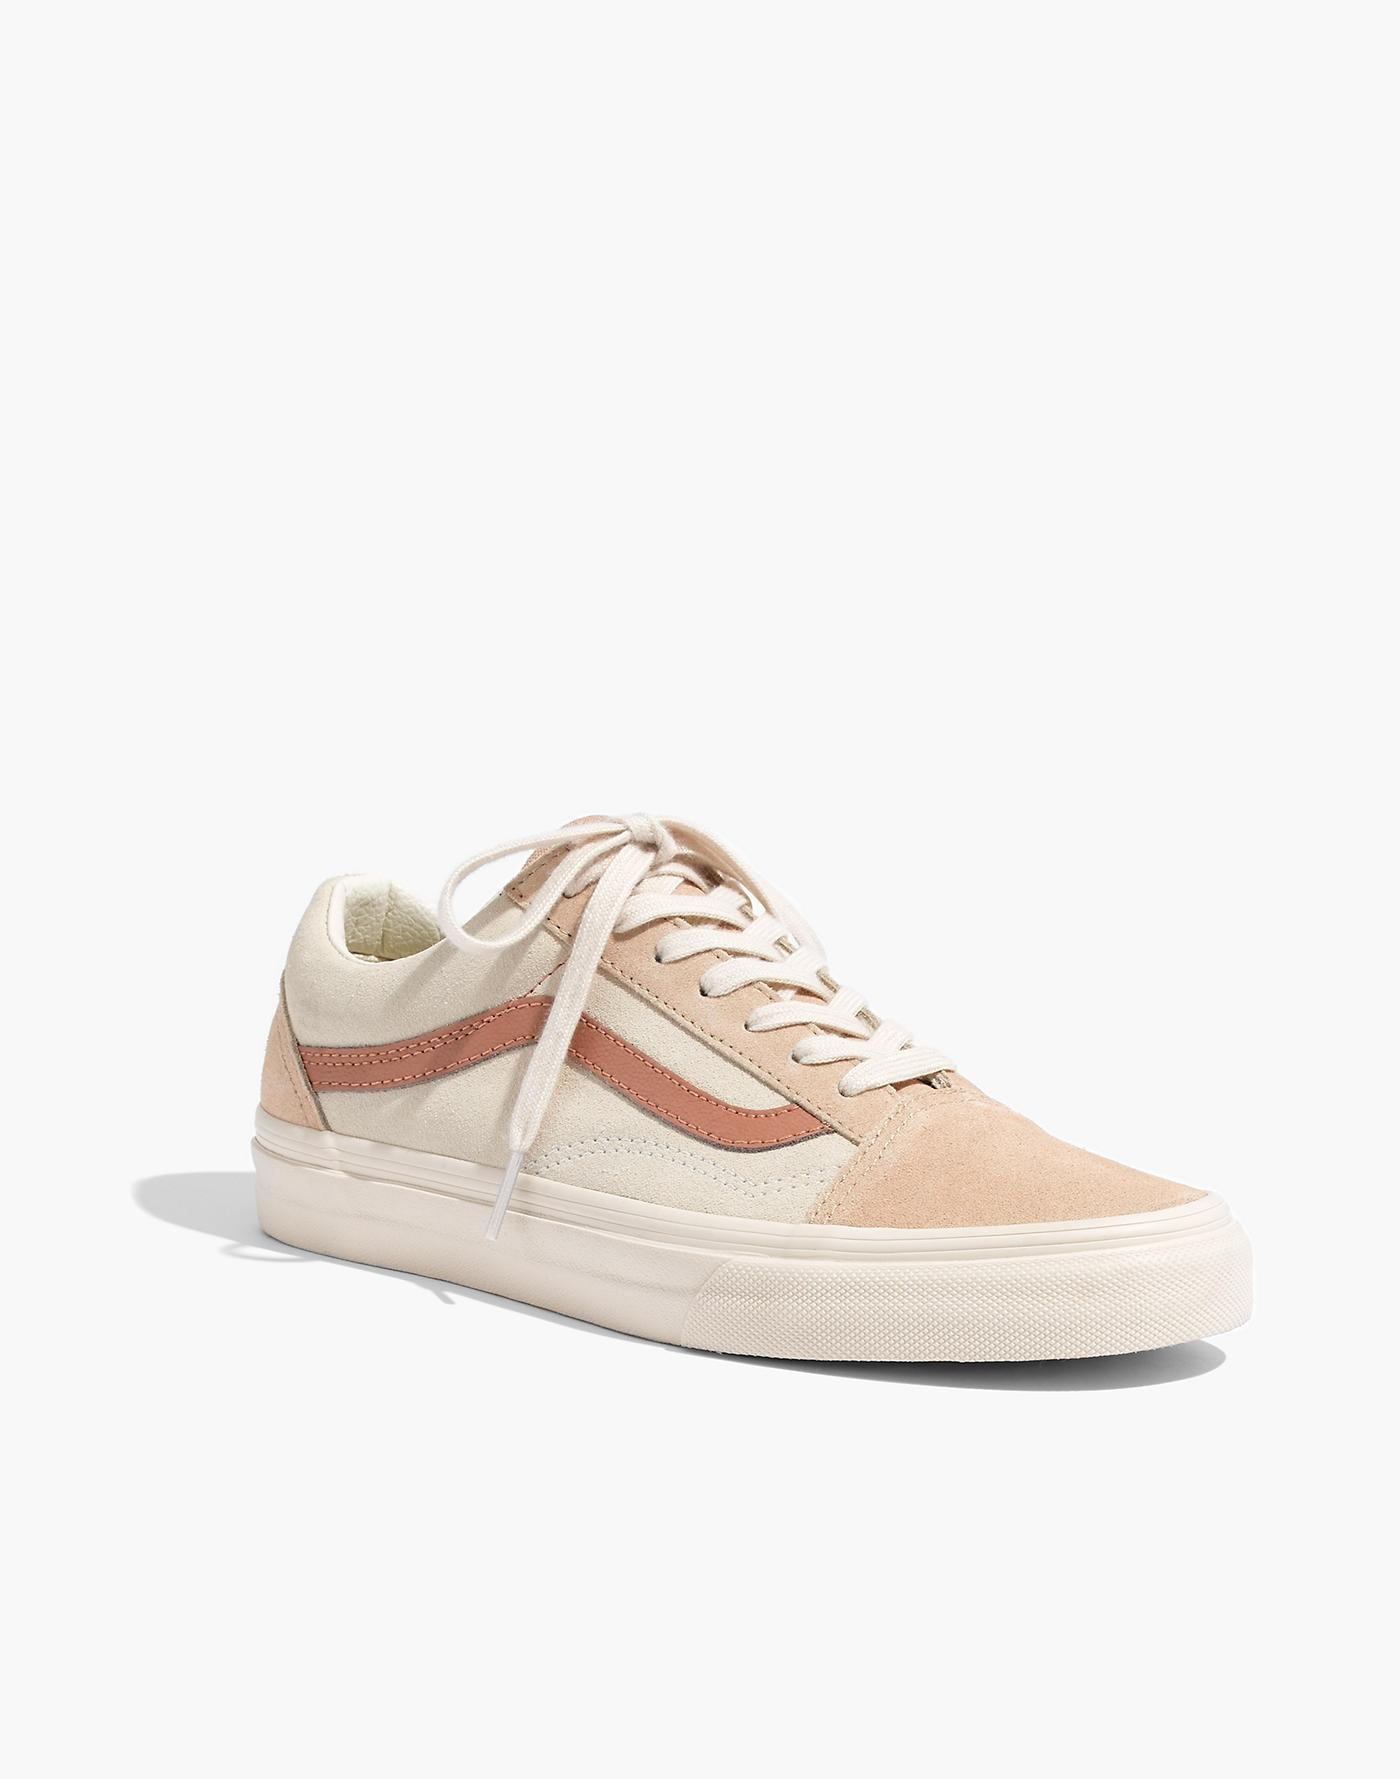 X Vans® Unisex Old Skool Lace-up Sneakers In Camel Colorblock